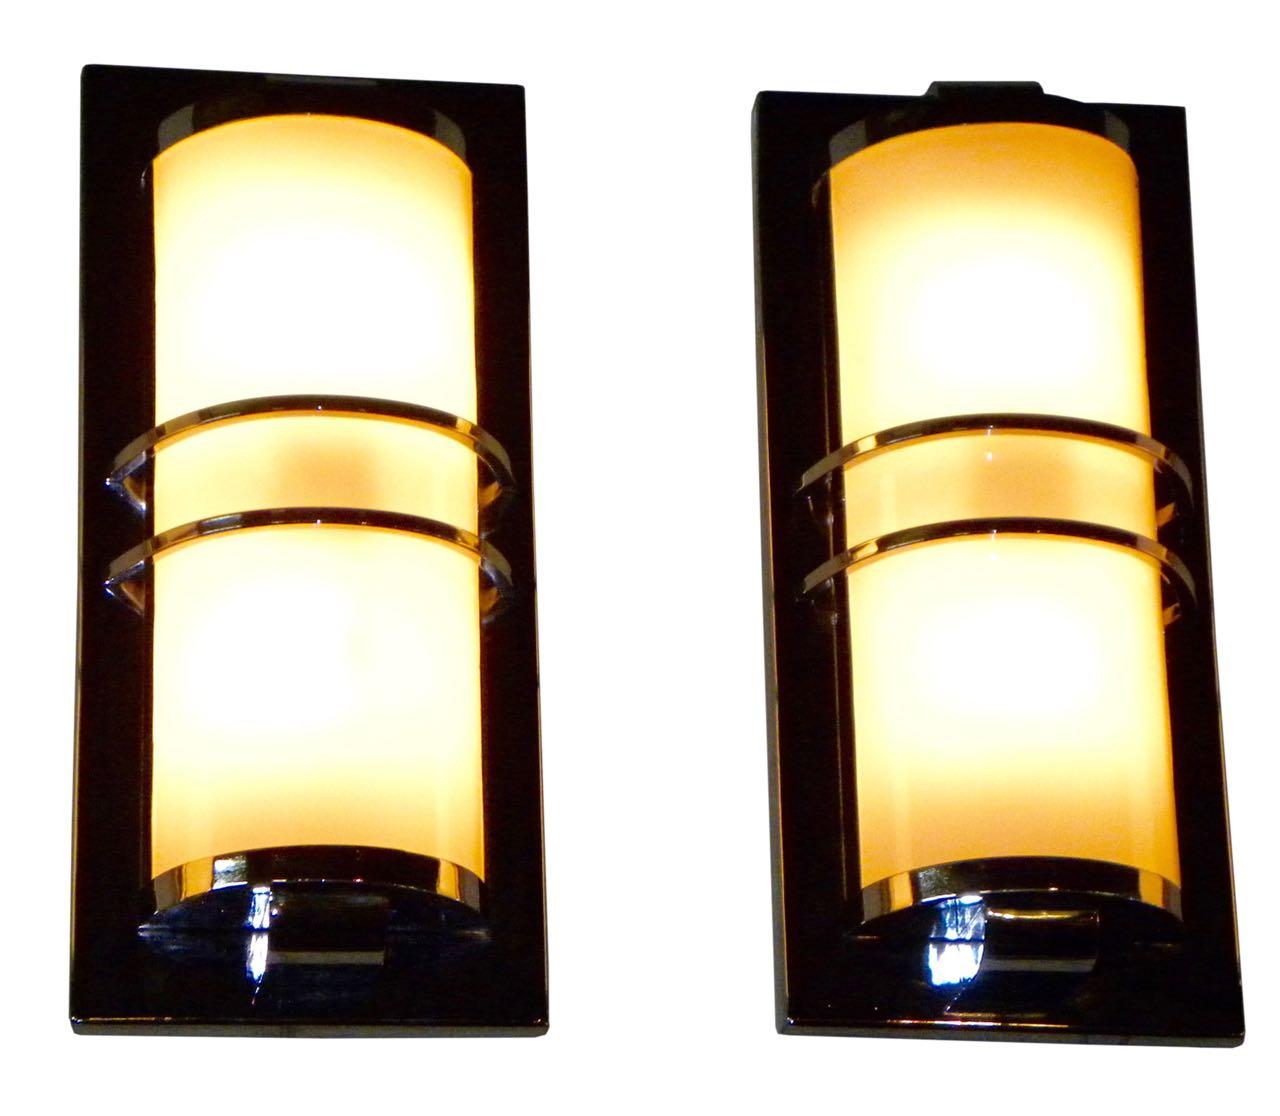 Custom Art Deco Sconces - Modernist Design